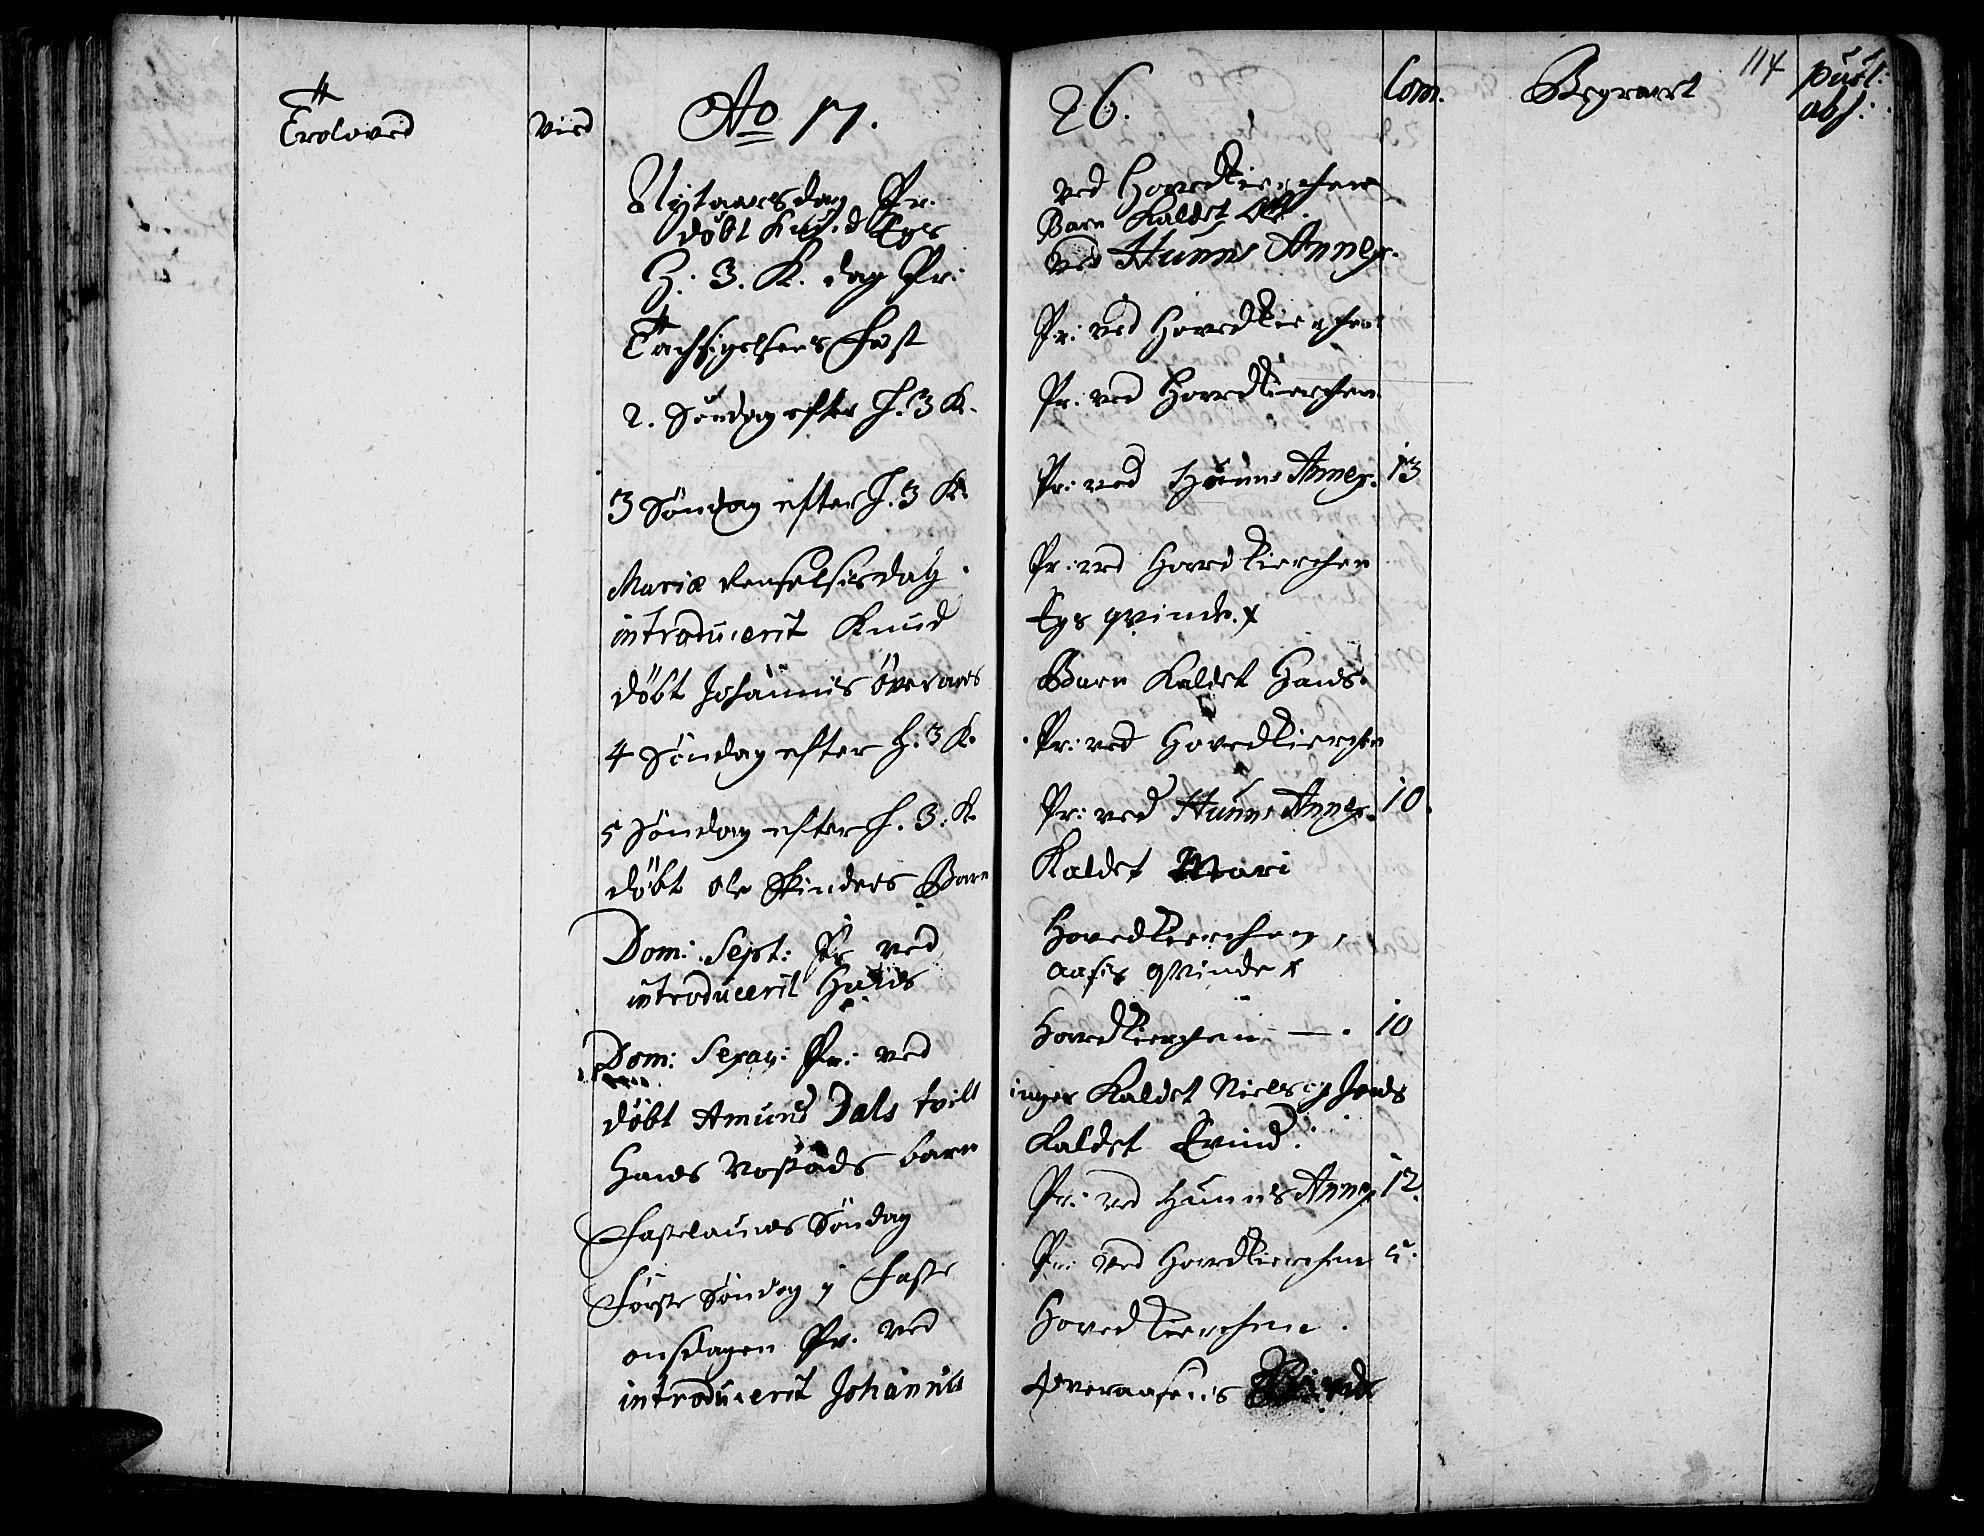 SAH, Vardal prestekontor, H/Ha/Haa/L0001: Ministerialbok nr. 1, 1706-1748, s. 114